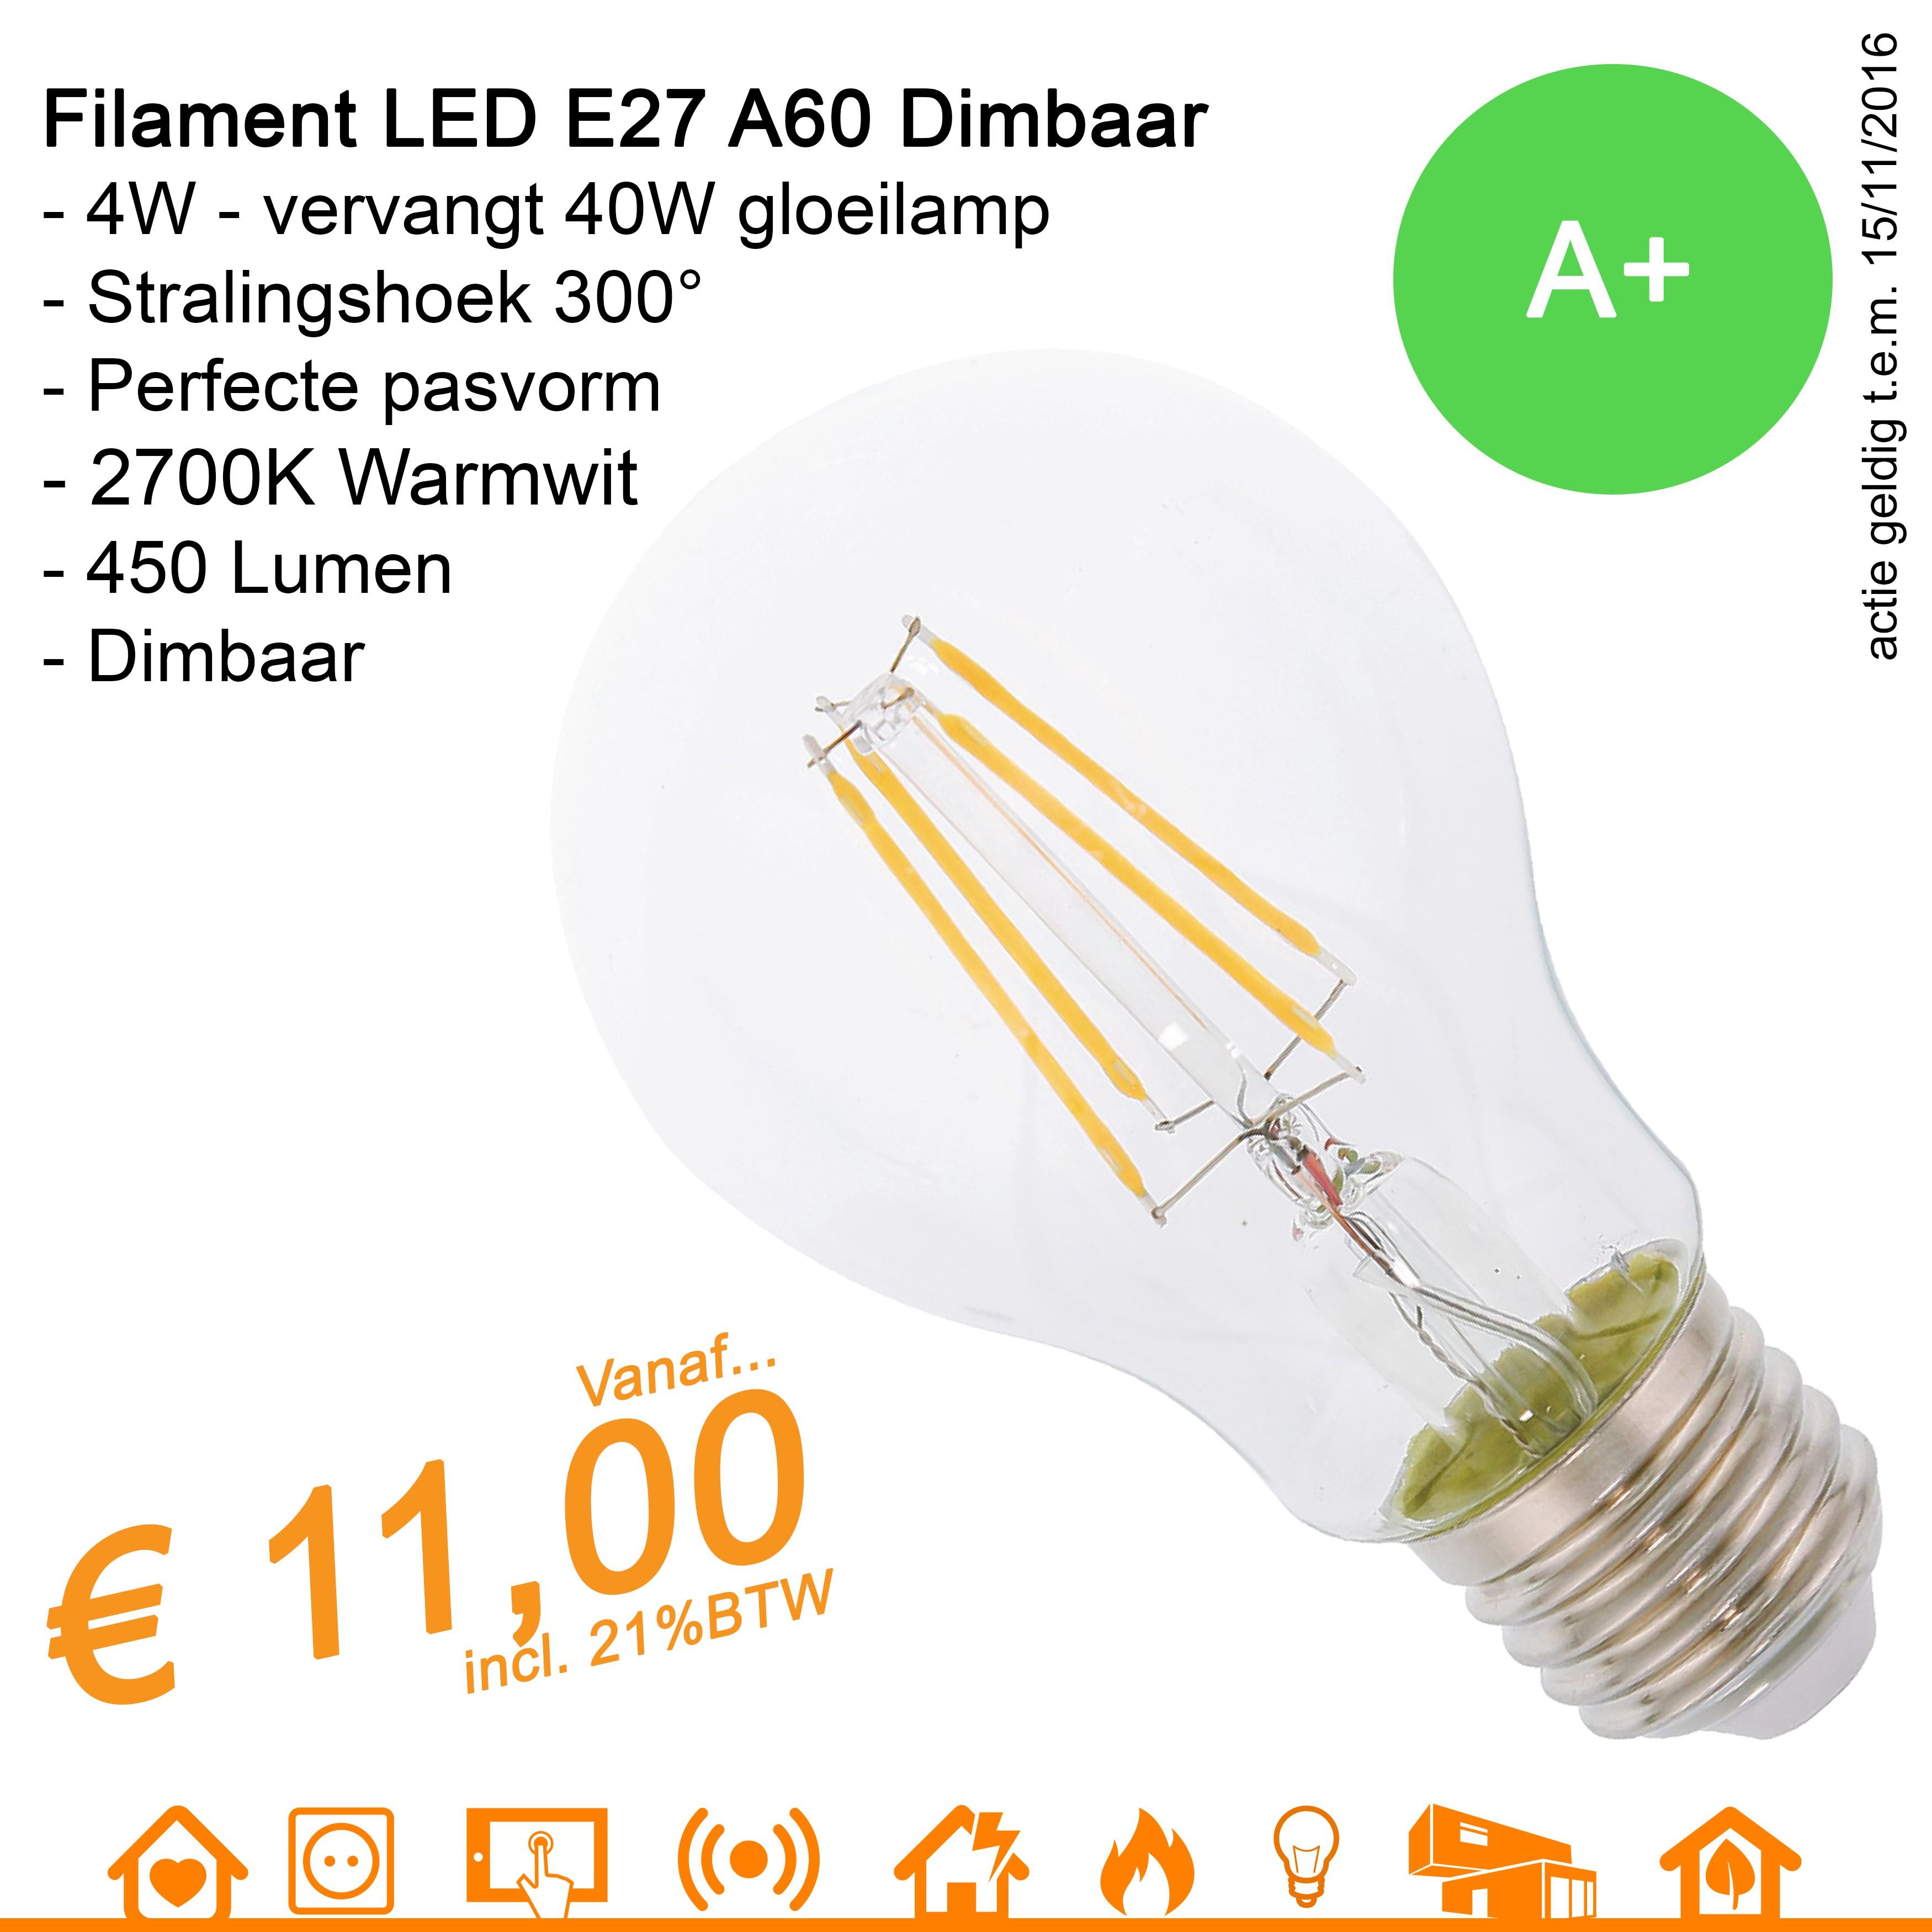 LED Retrofit Filament Lamp E27 A60 4W 450Lumen warmwit 2700K DIMBAAR